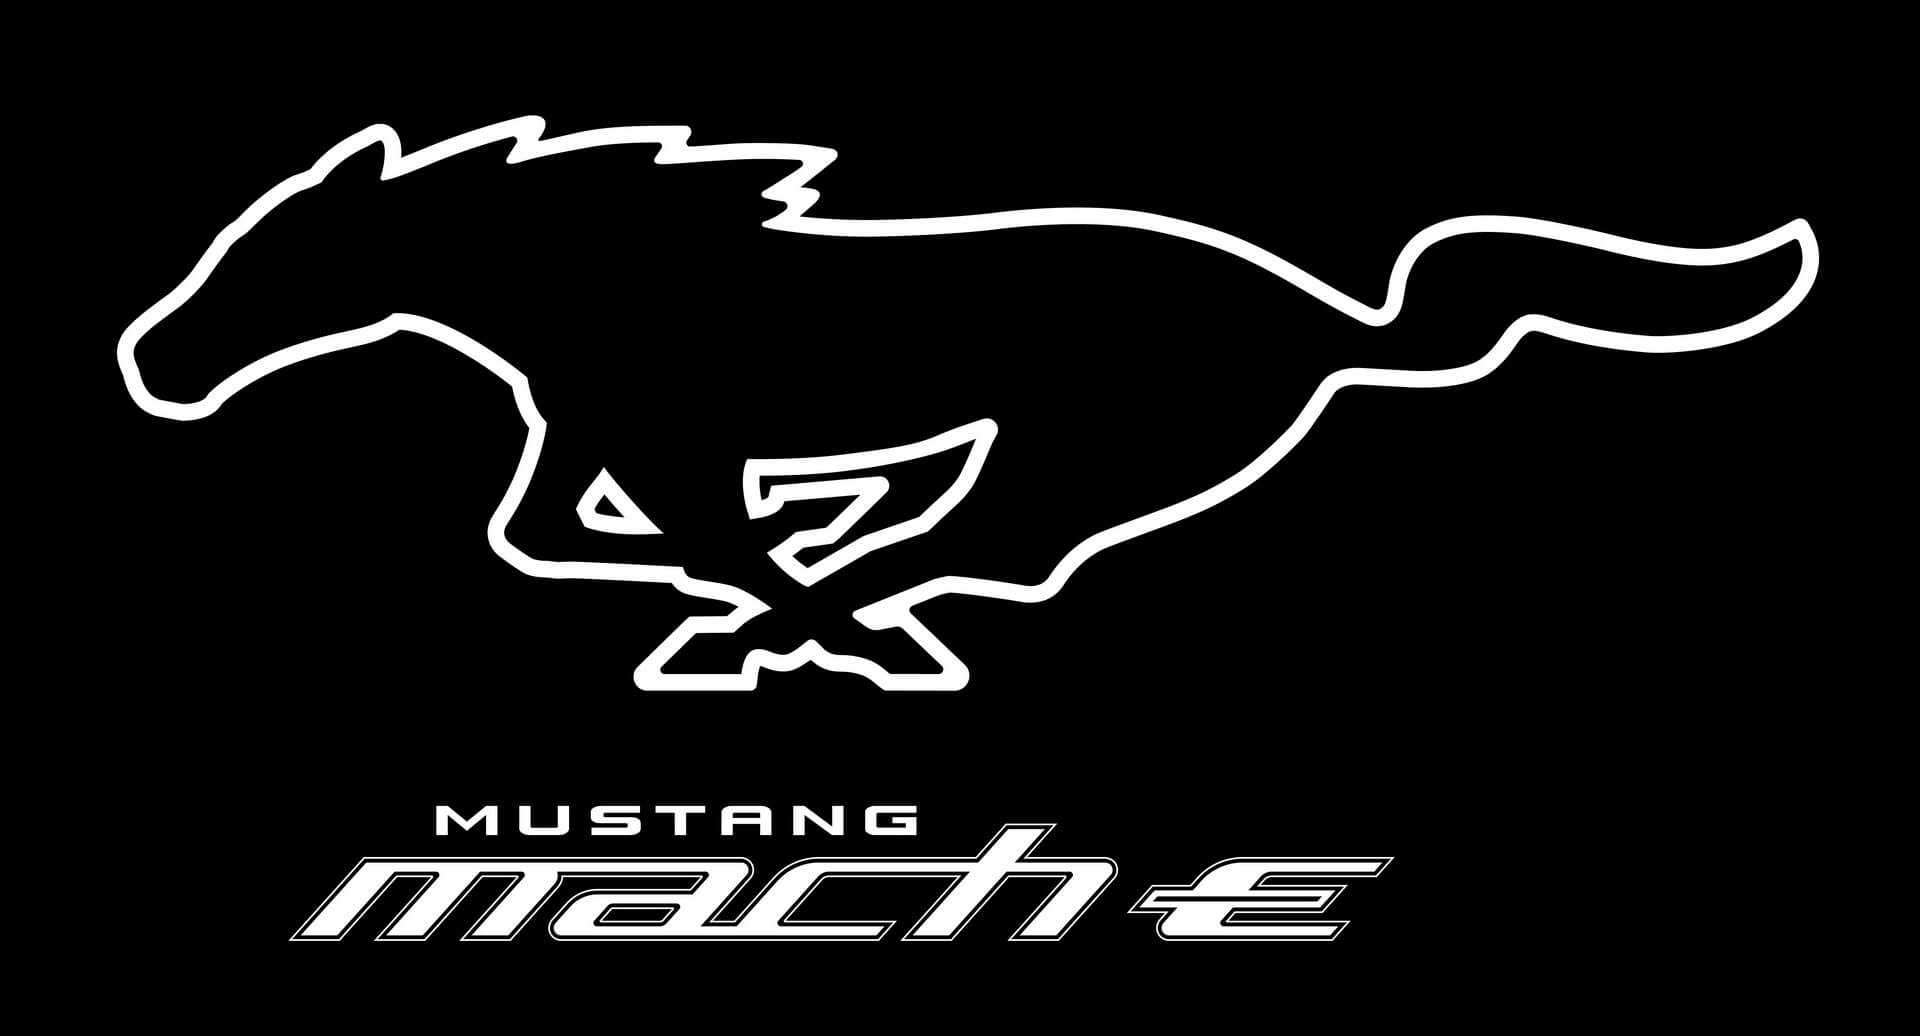 Логотип Mustang Mach-E Pony